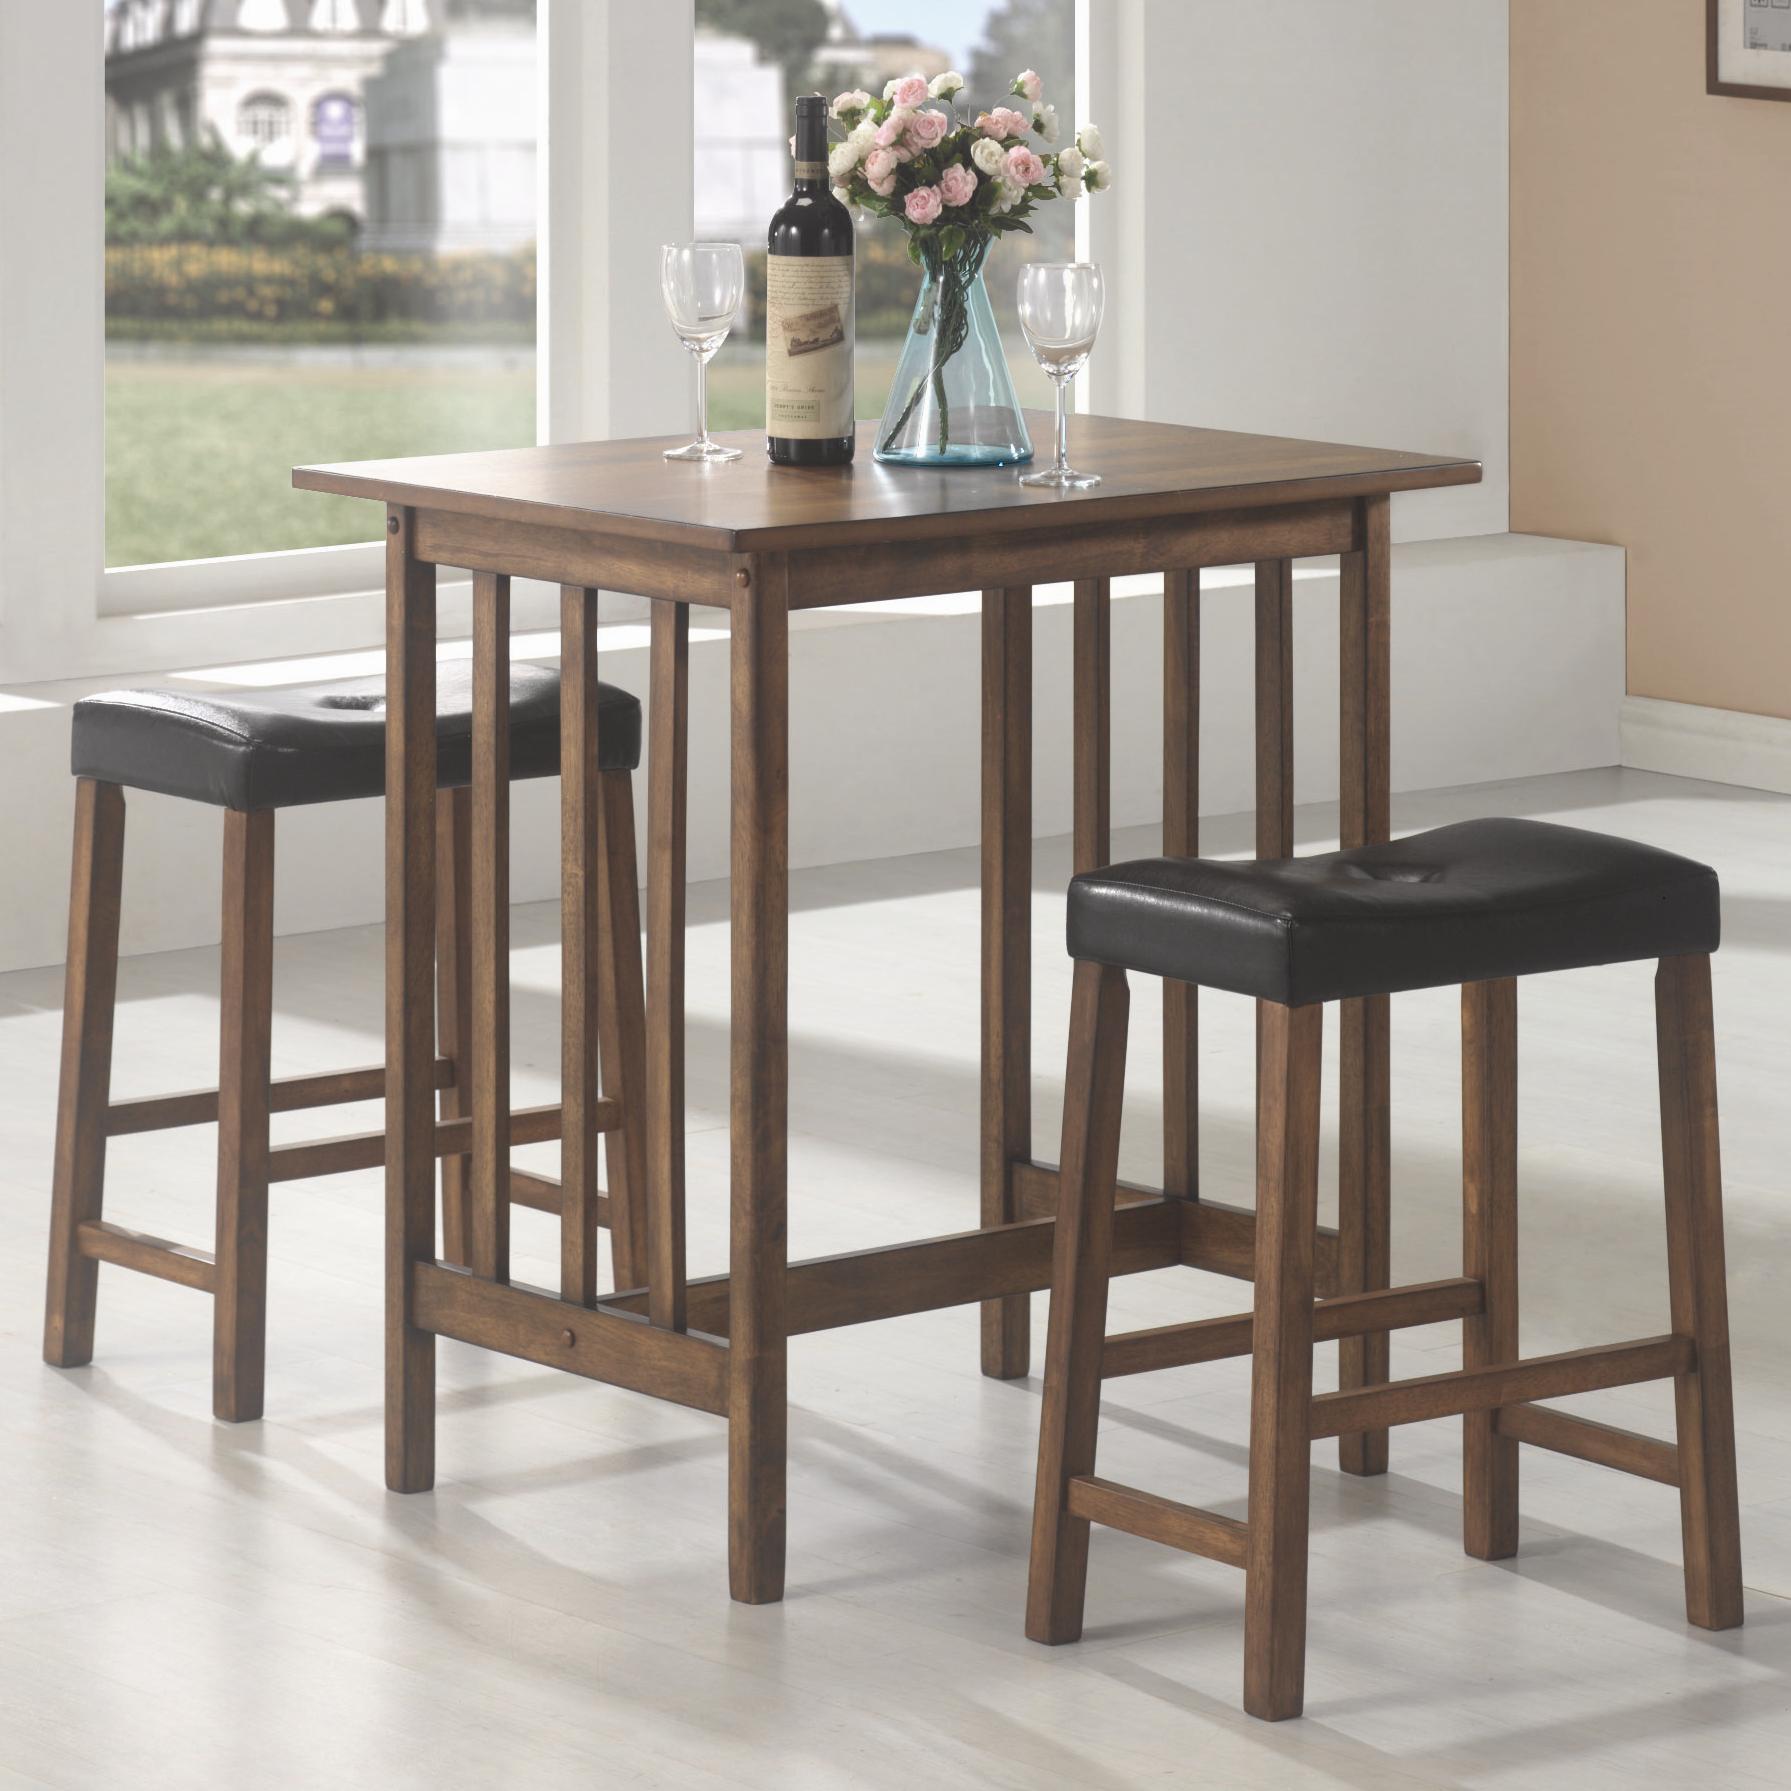 3 Piece Bar Table And Stool Set. Table Set